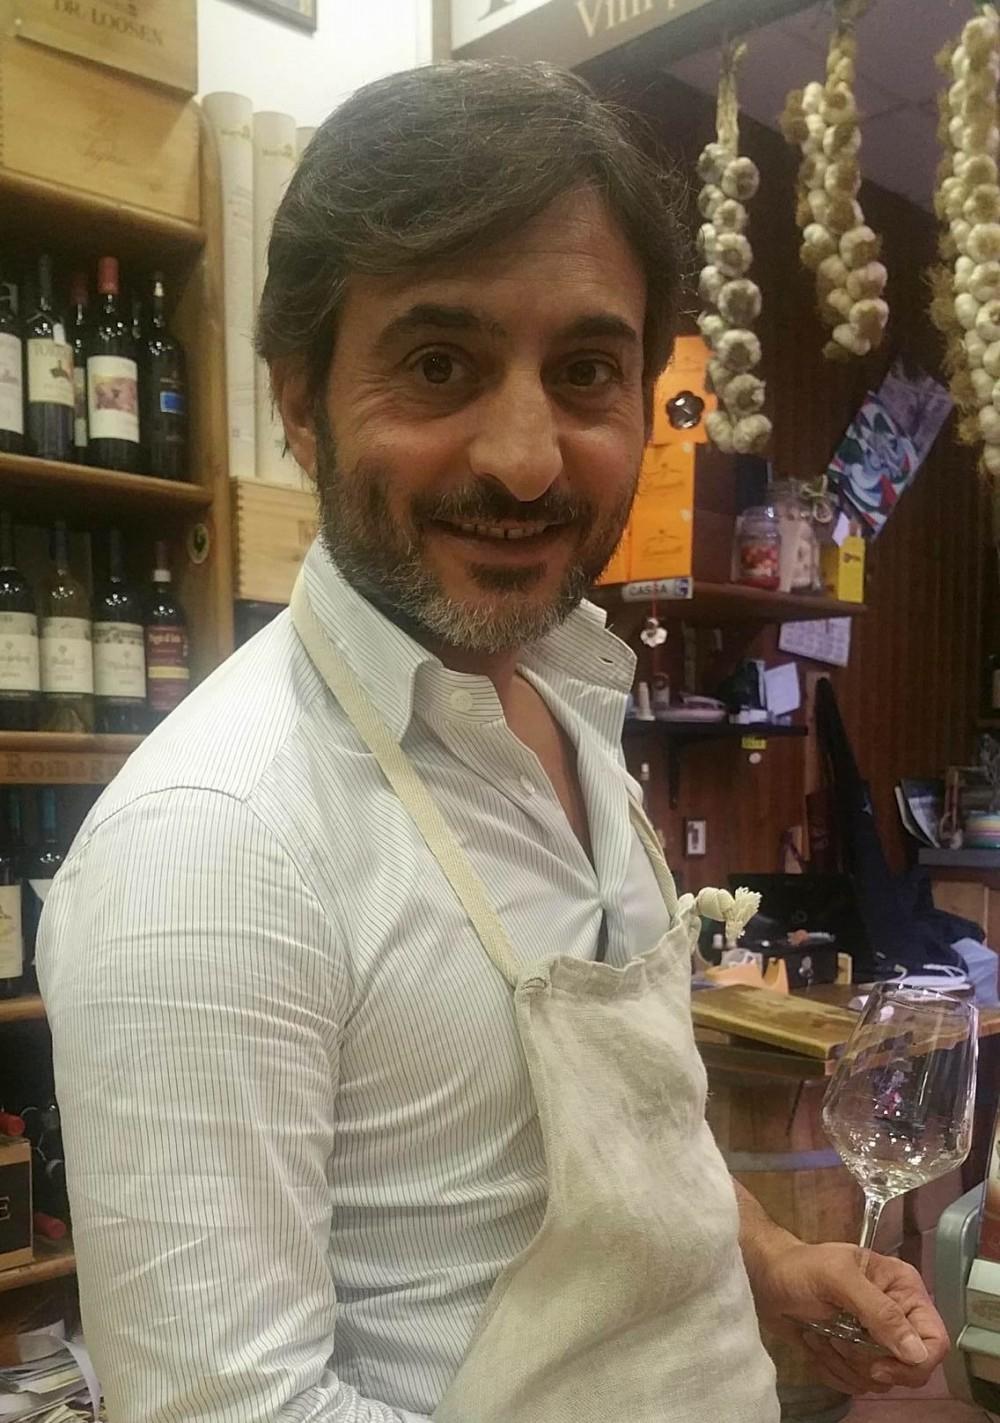 Enoteca Iorio, Pasquale Iorio